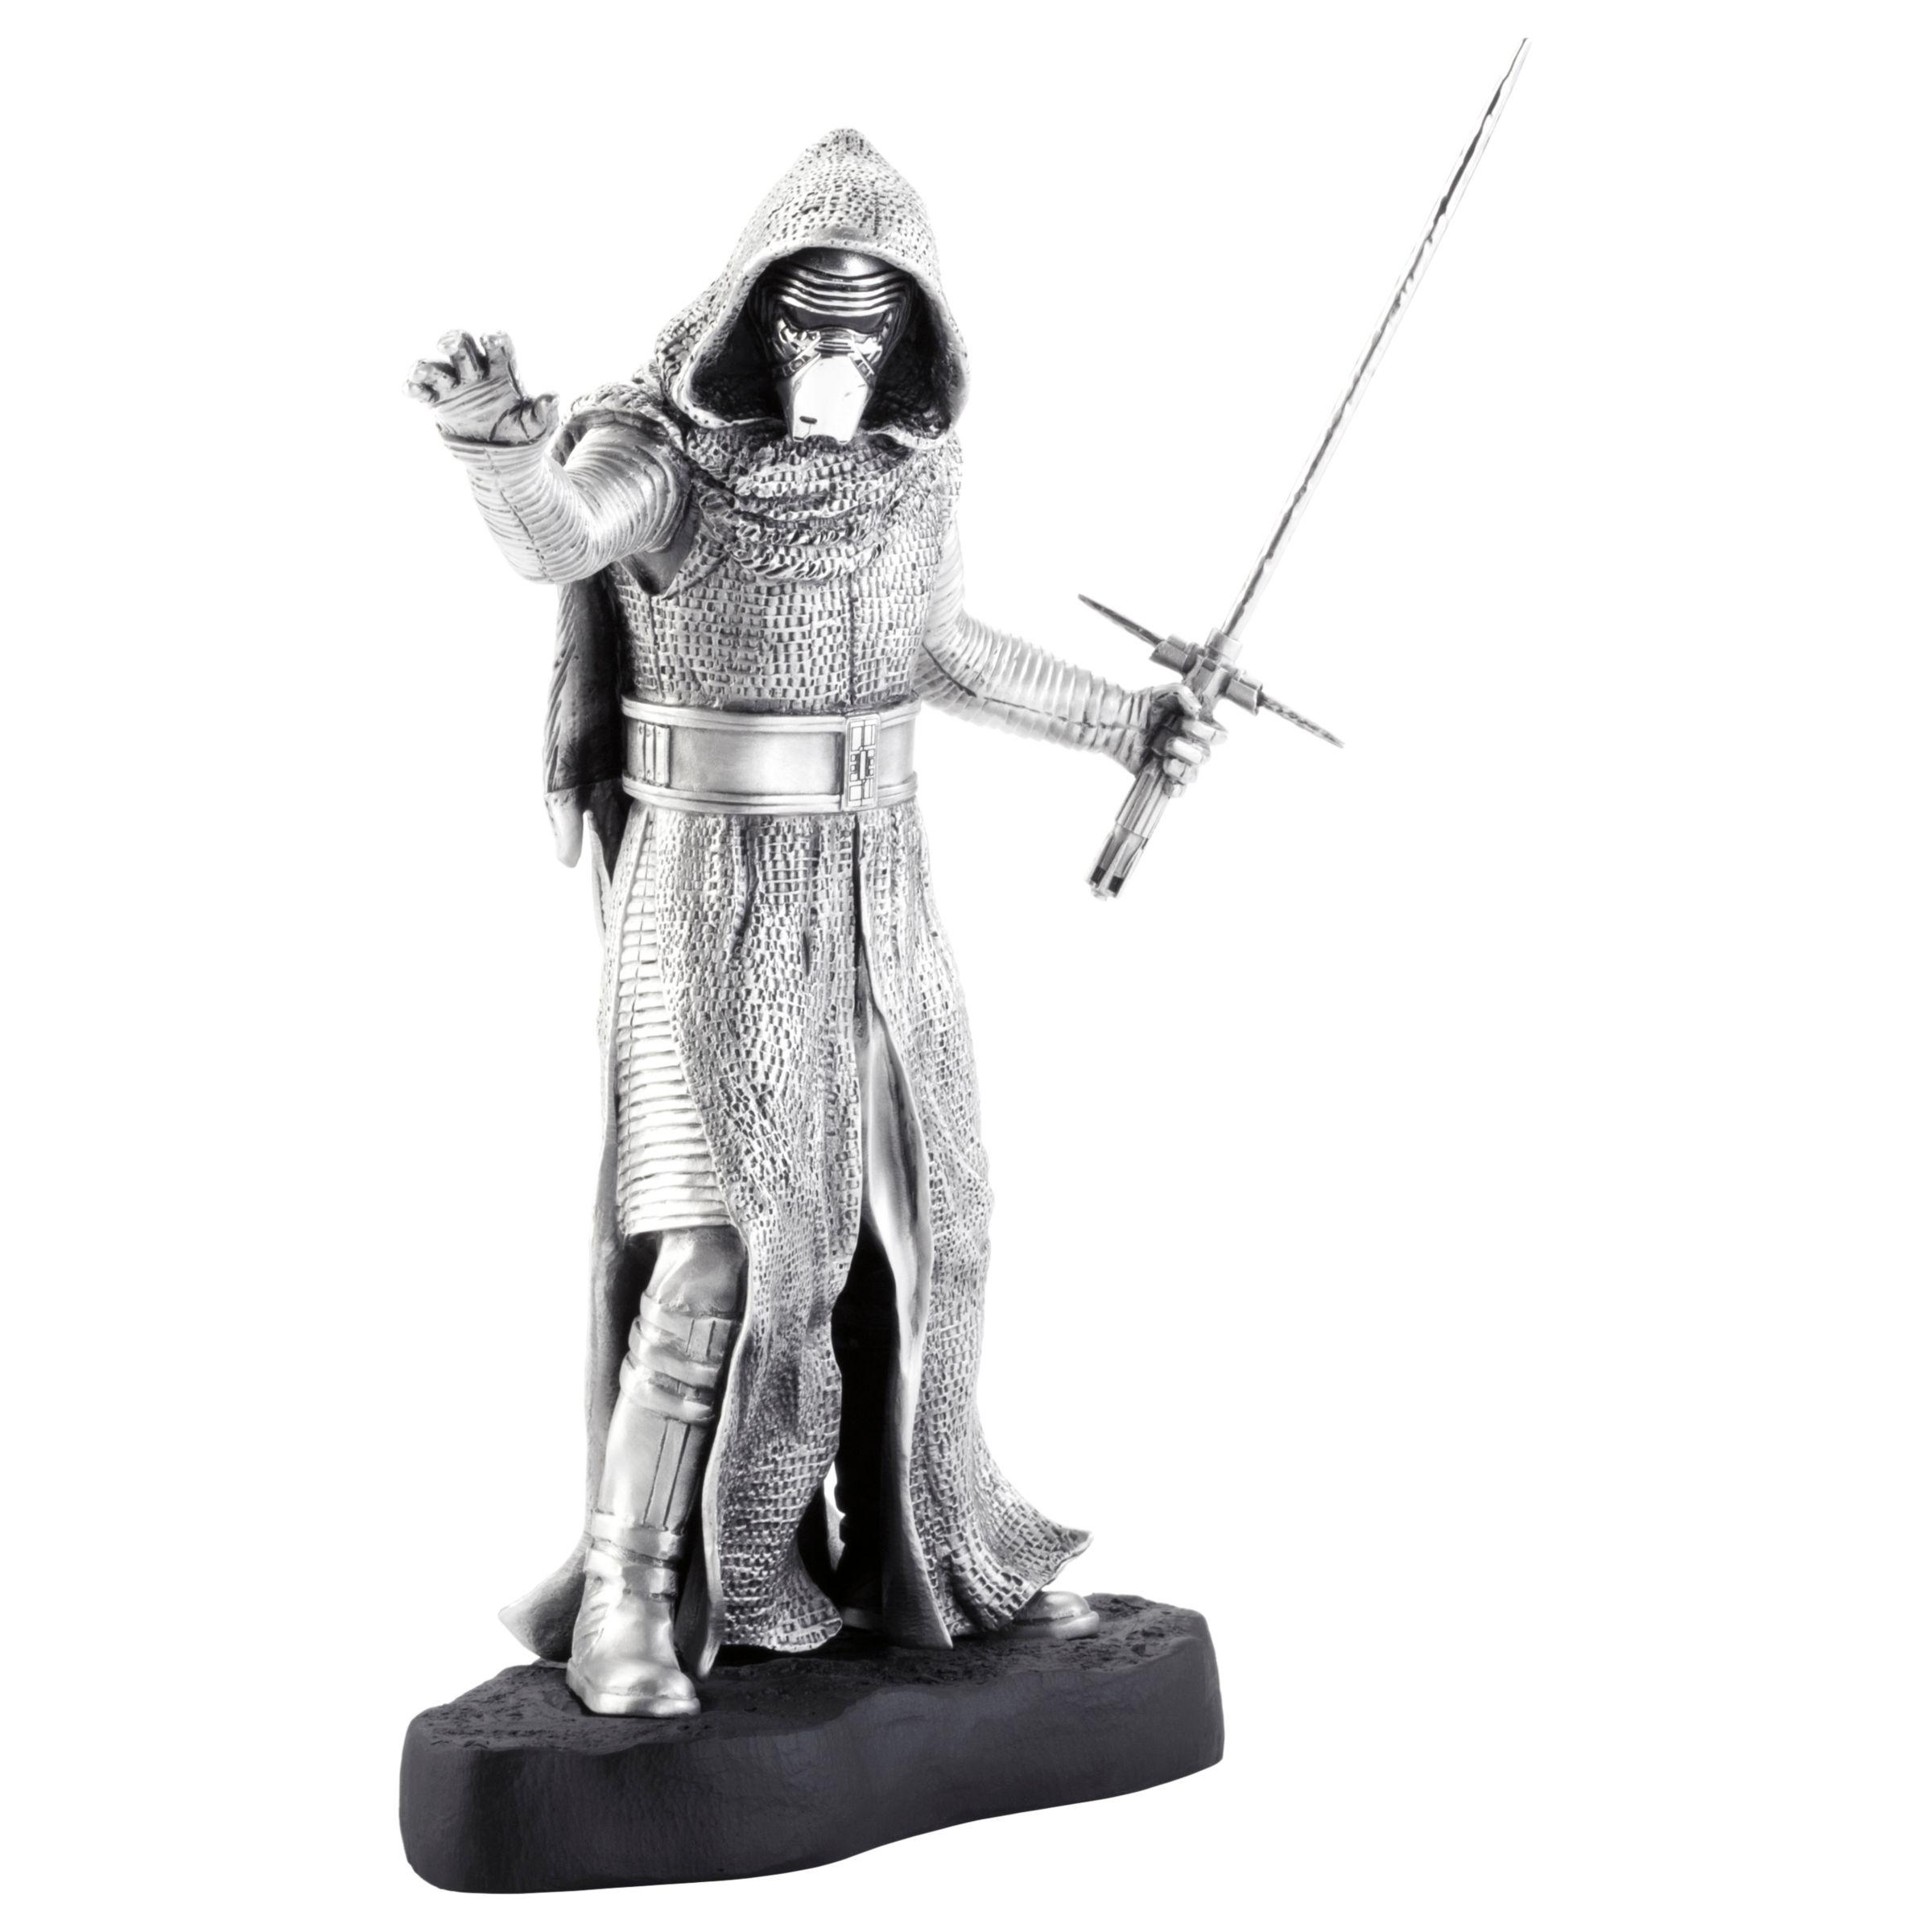 Royal Selangor Royal Selangor Star Wars Kylo Ren Figurine, Limited Edition